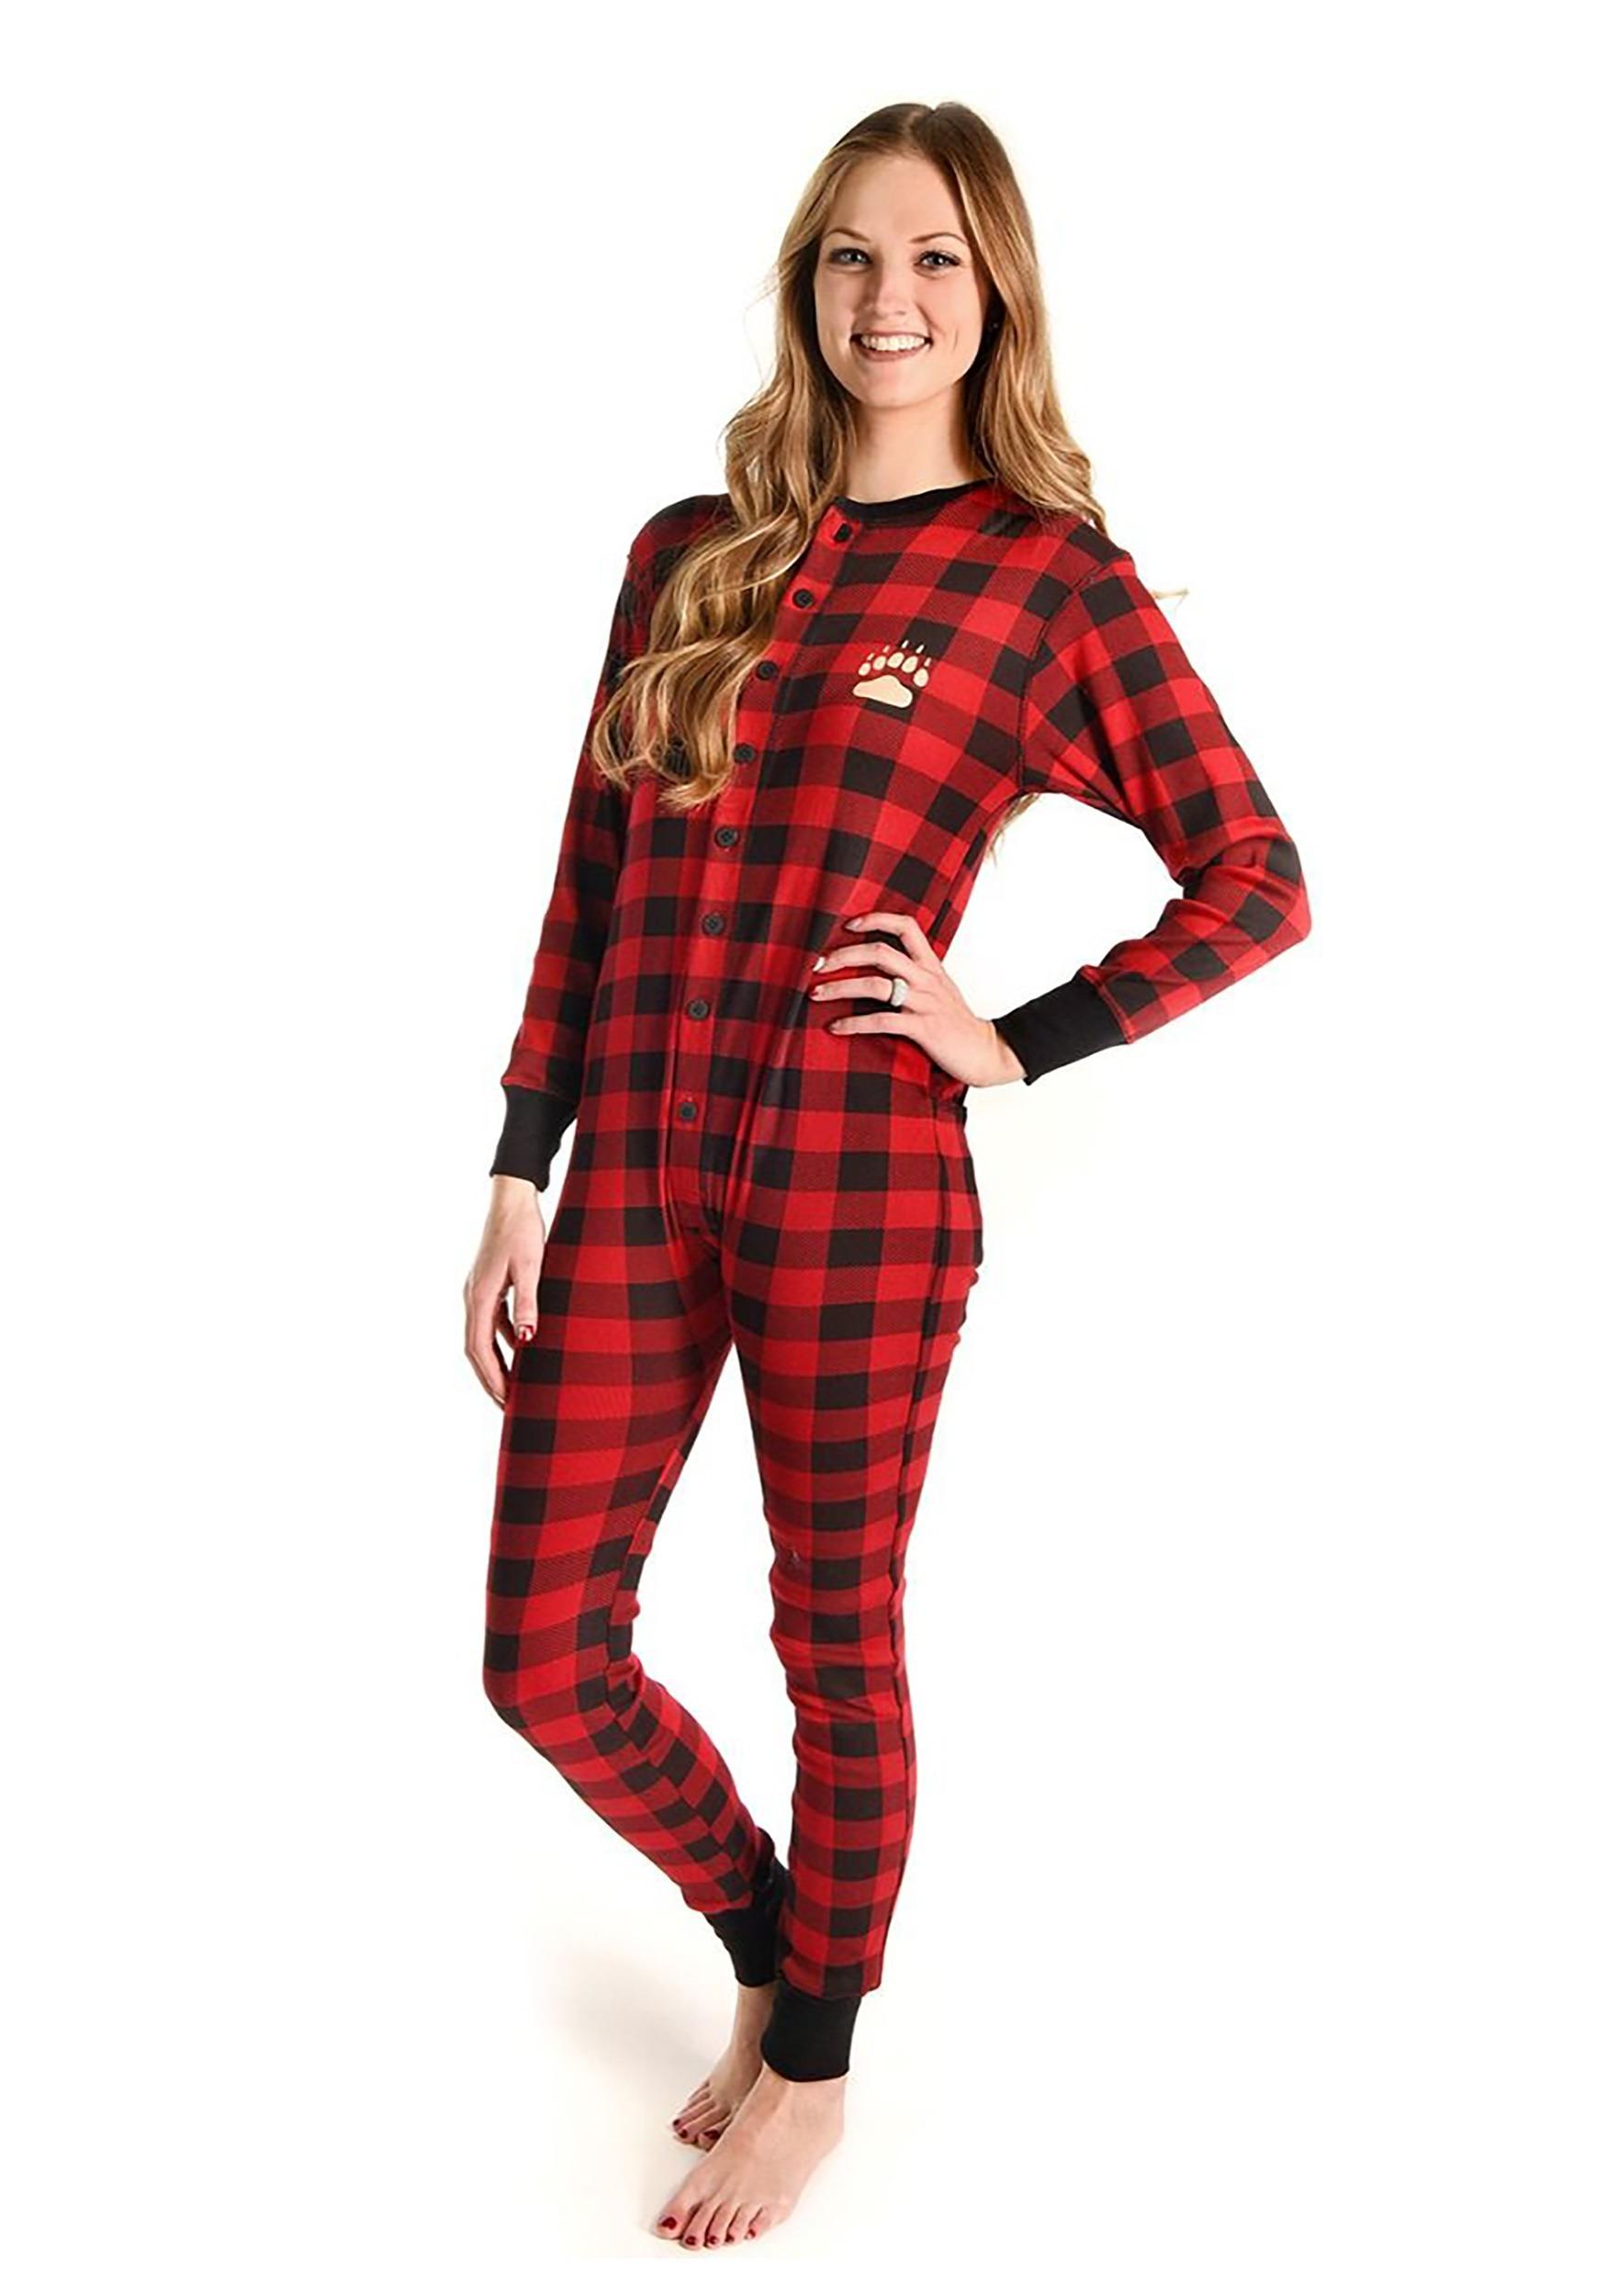 Bear Cheeks Flapjack Pajamas for Adults e0bf7f191